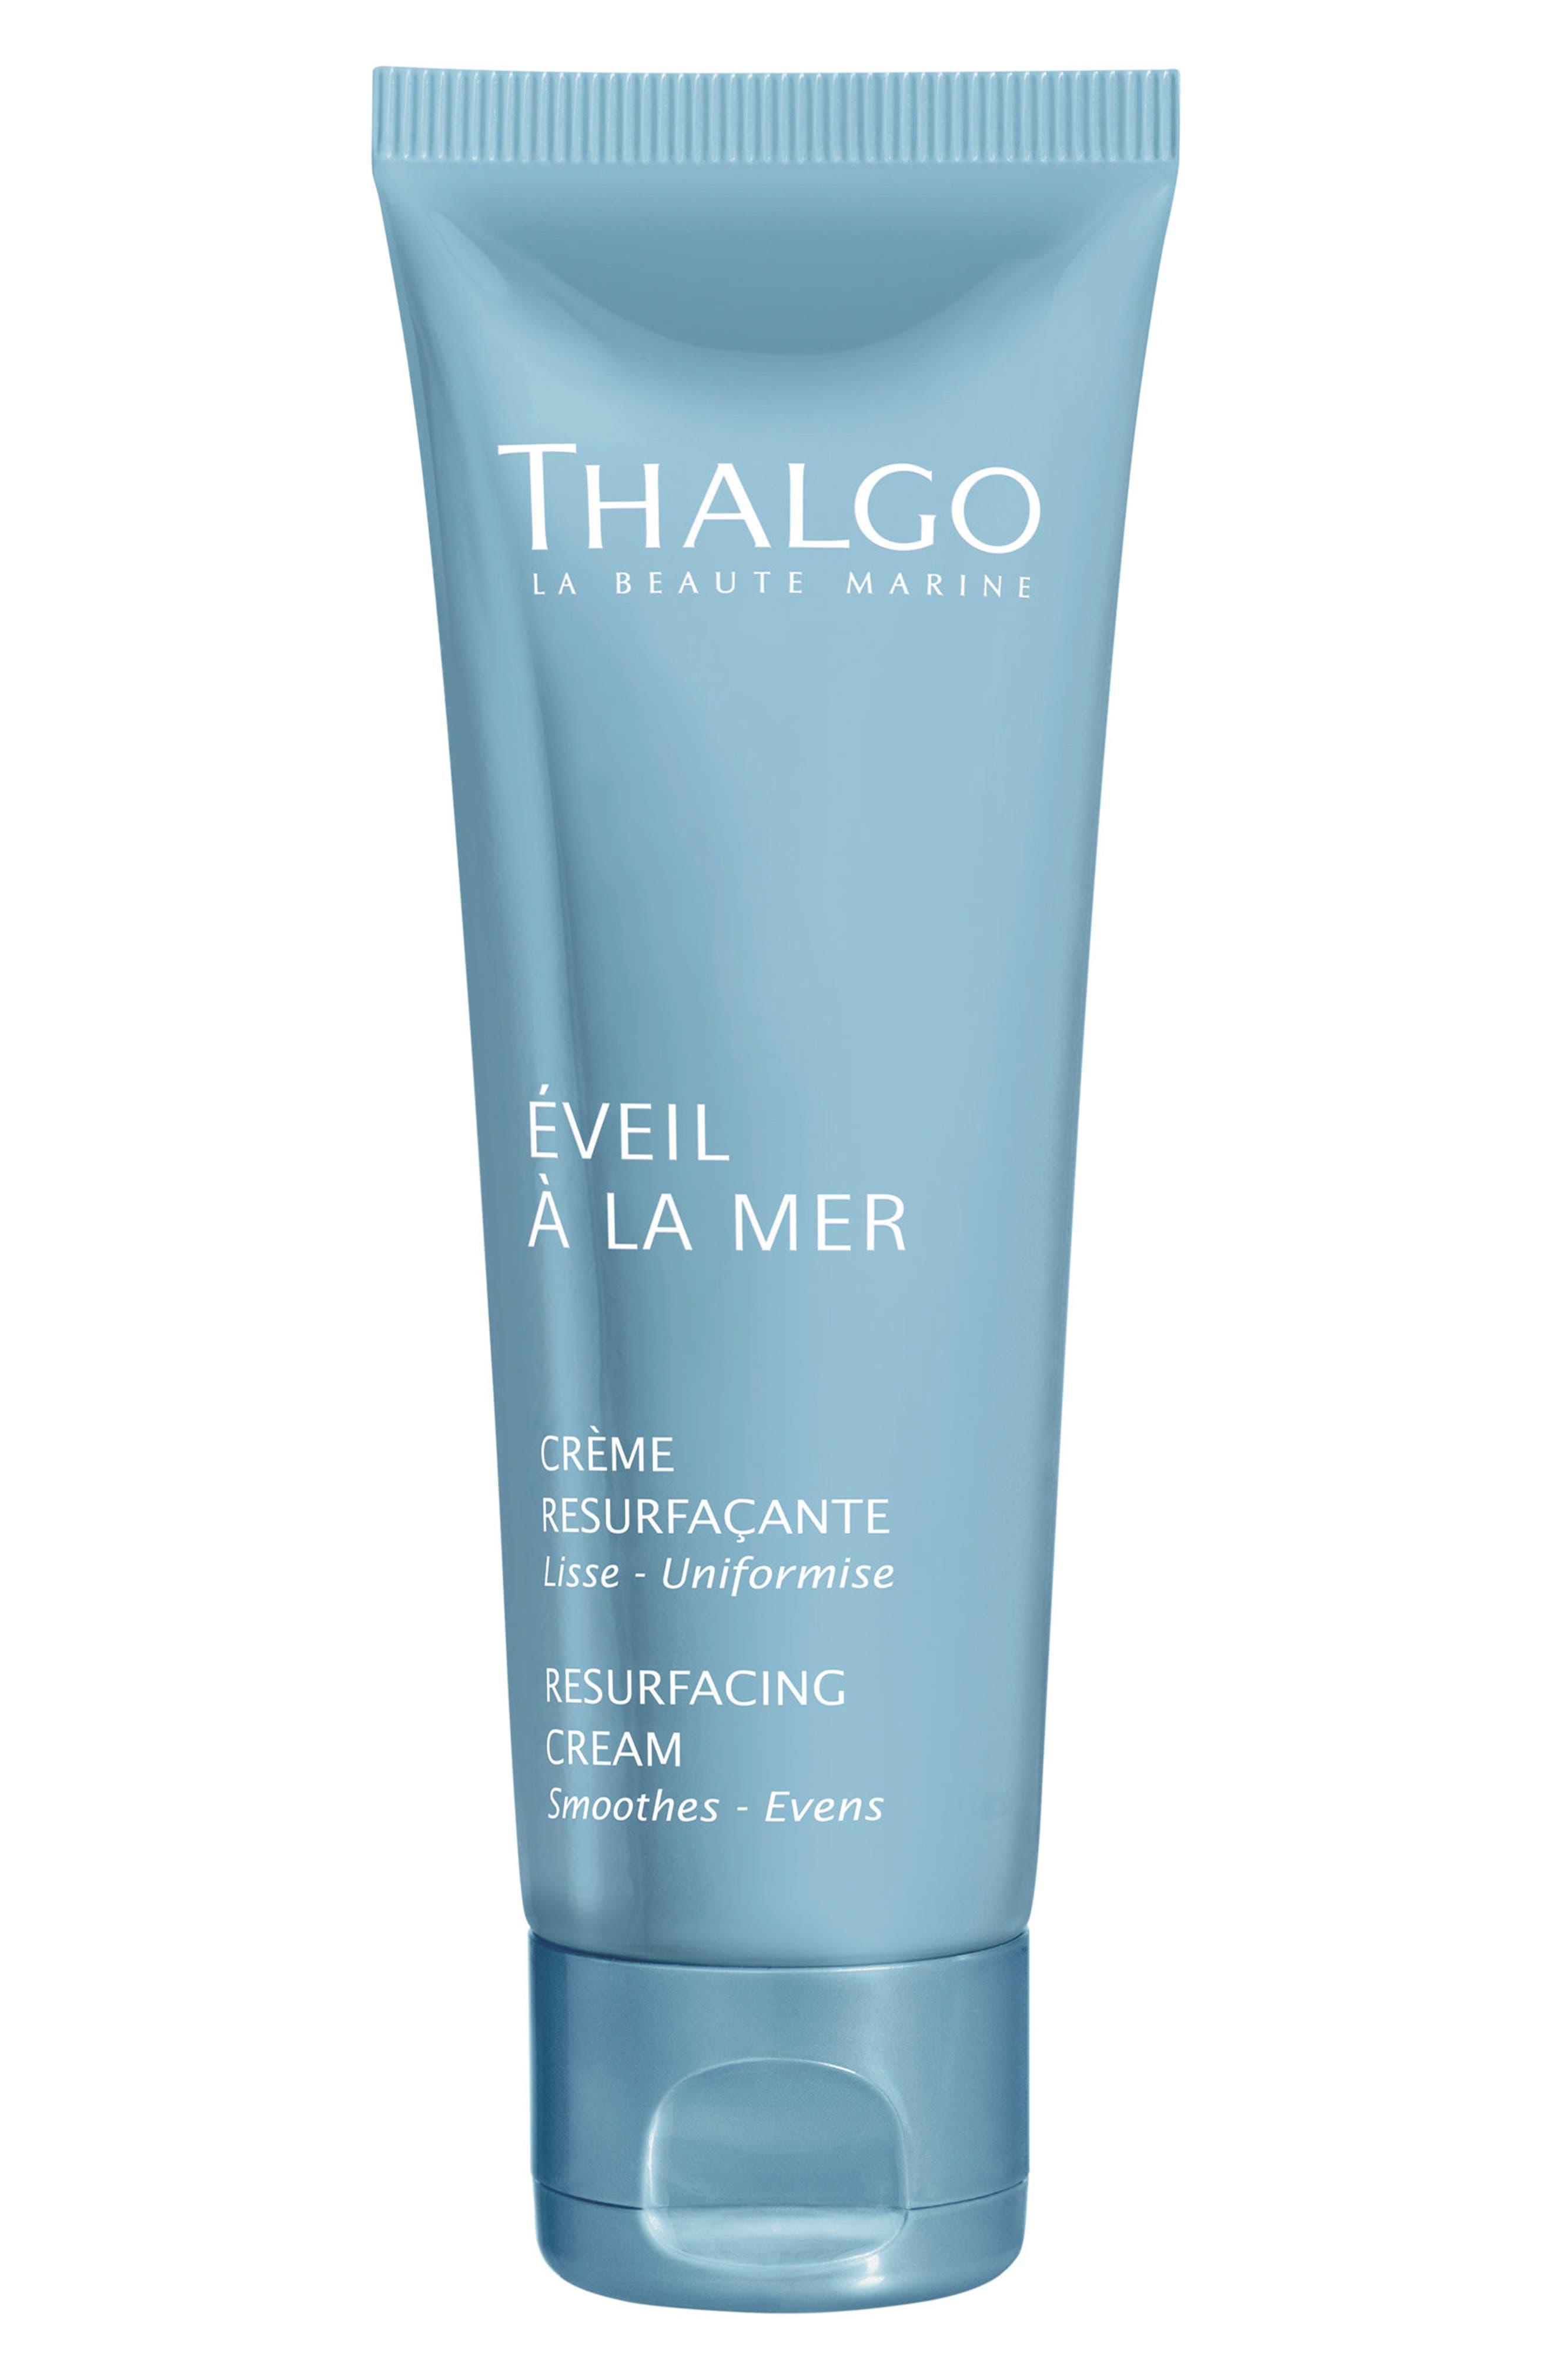 Thalgo Resurfacing Cream